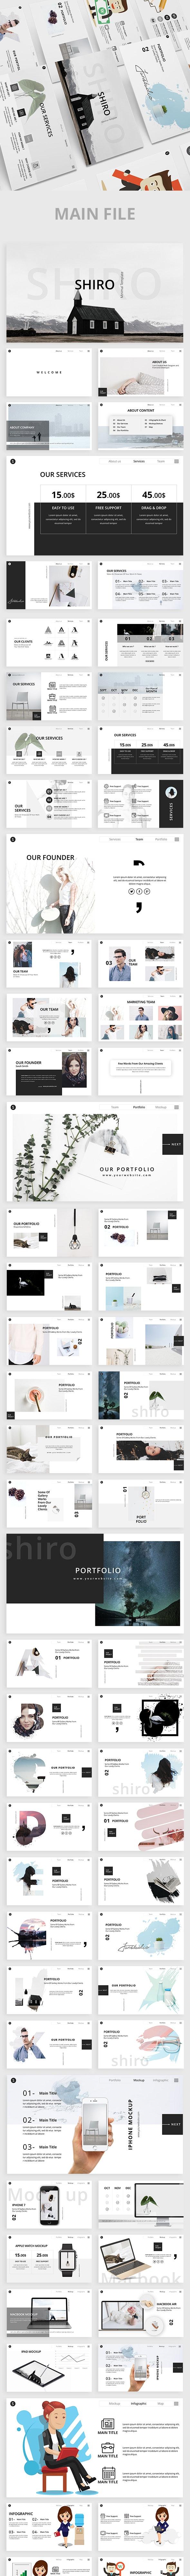 Shiro Minimal Powerpoint Template - Creative PowerPoint Templates